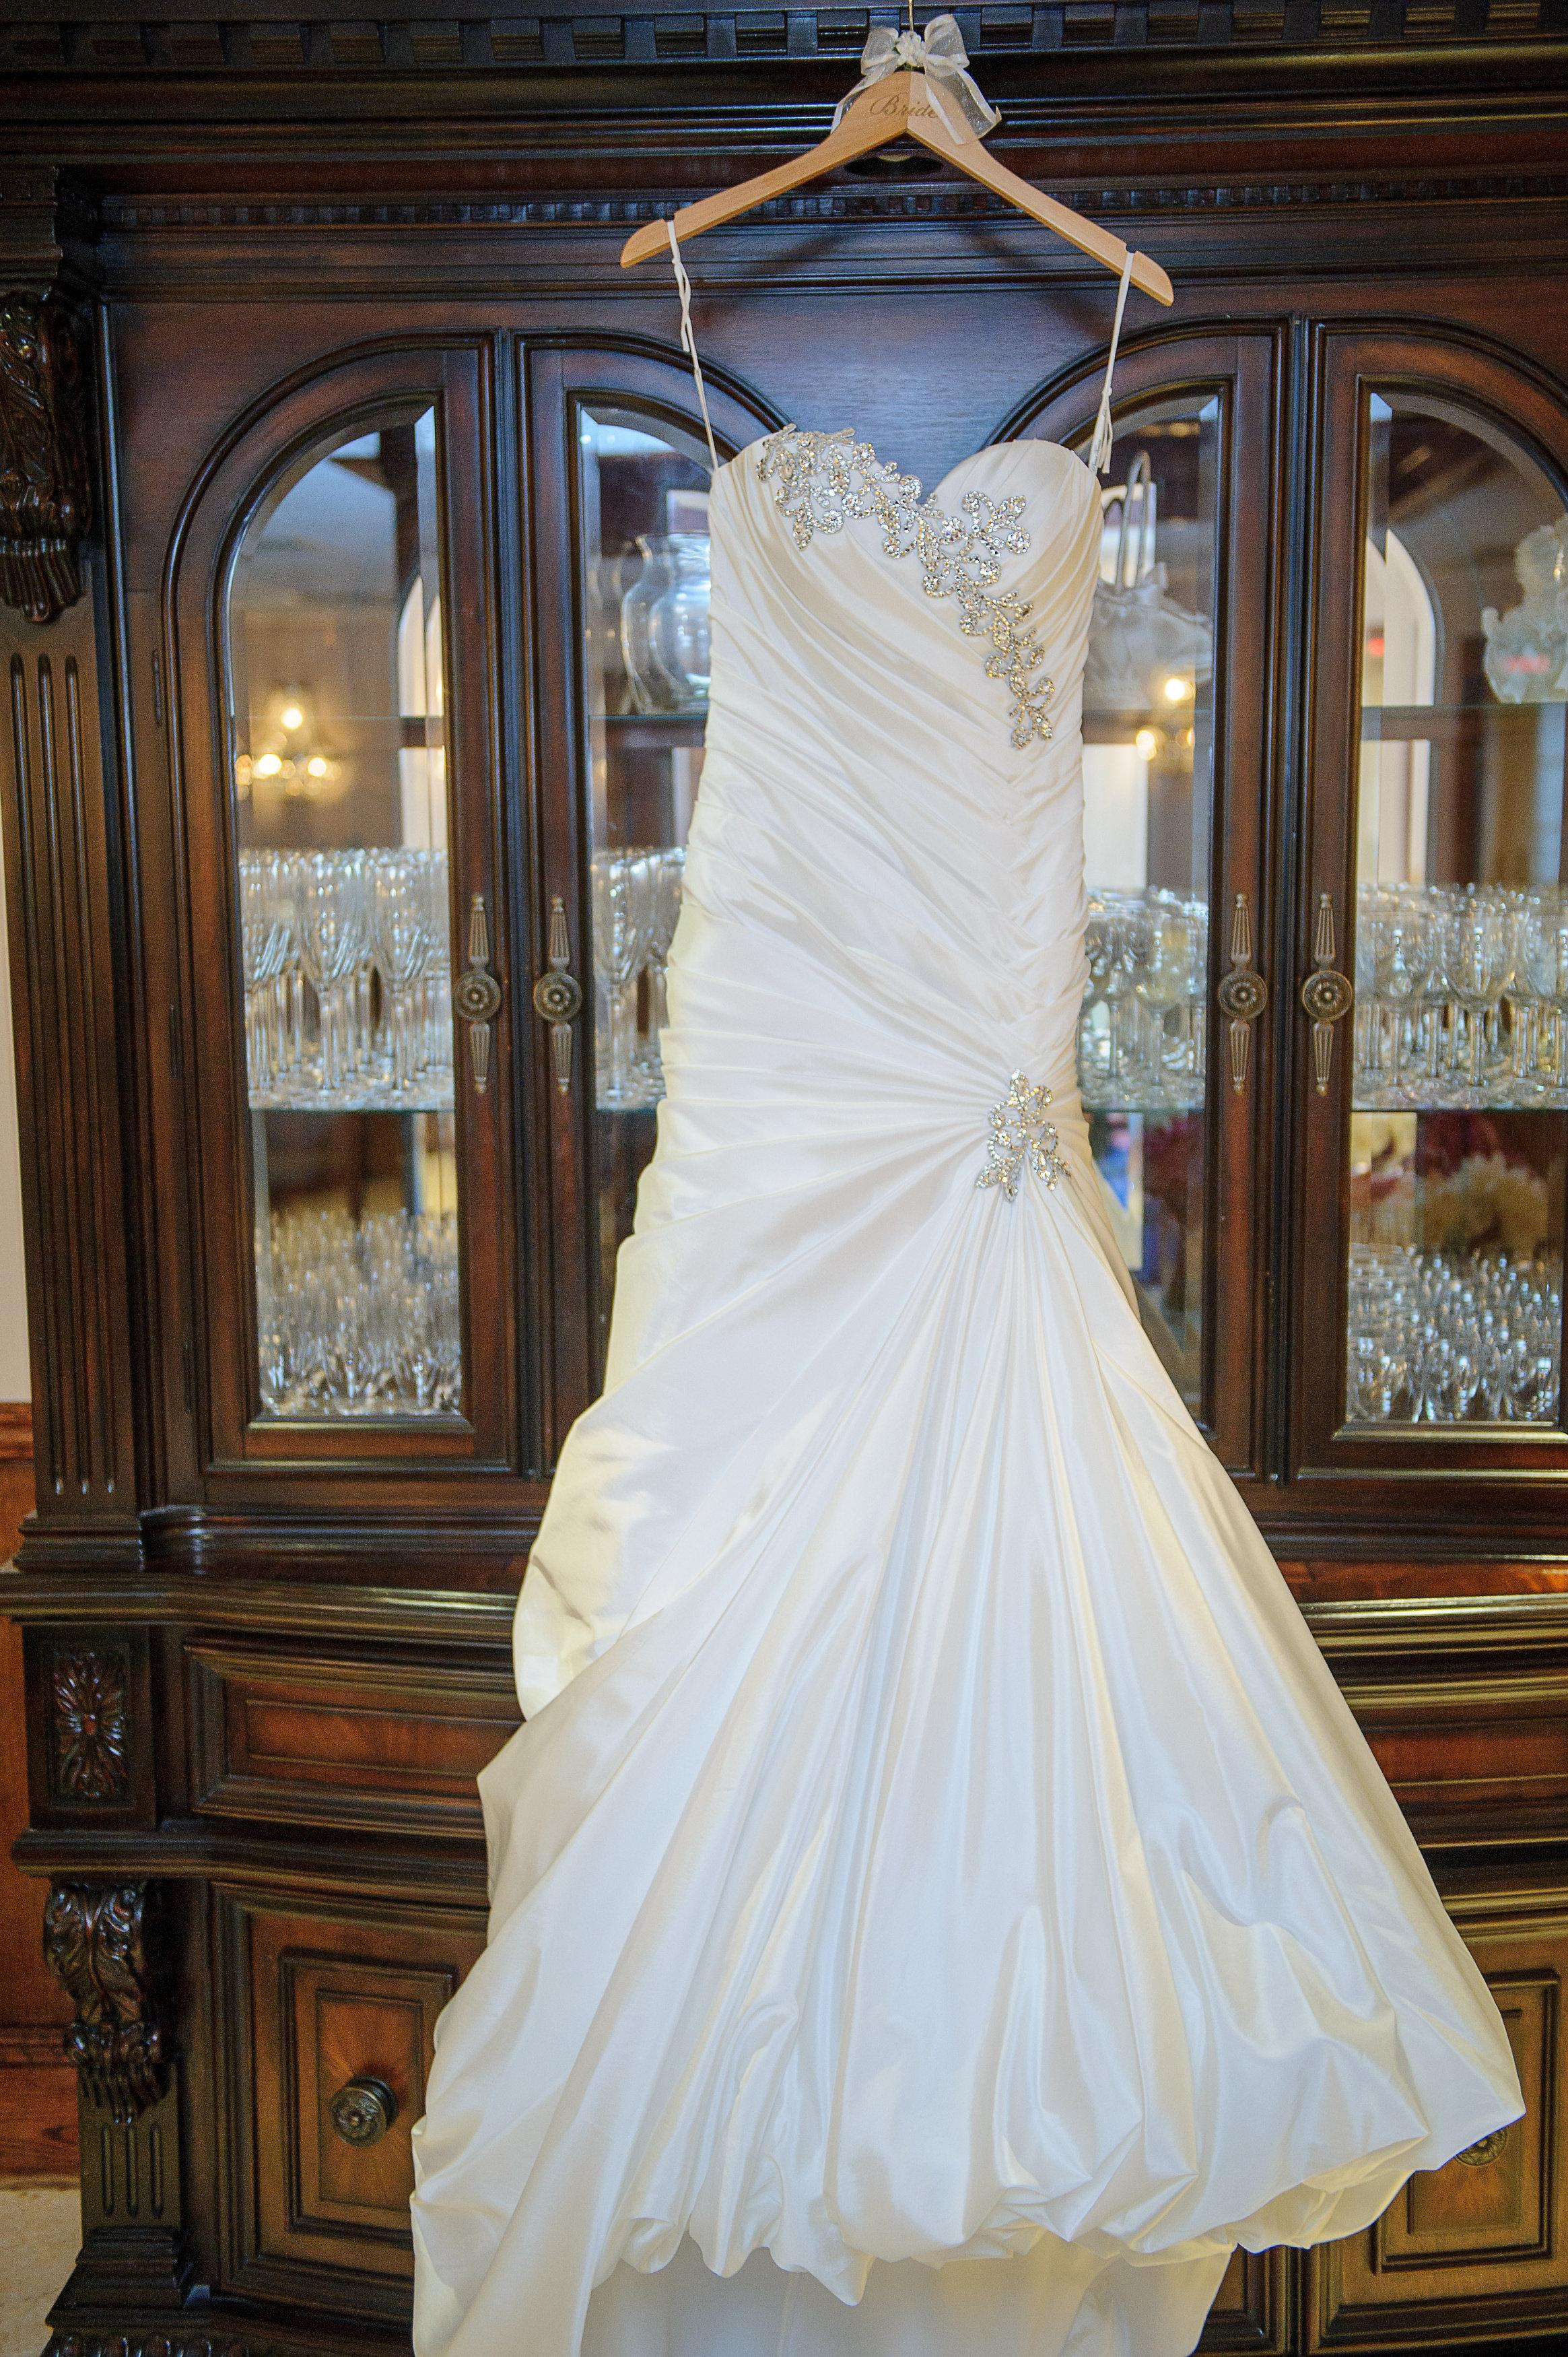 Ceci_New_York_Custom_Invitation_ New_Jersey_Wedding_Luxury_Personalized_Ceci_Style_Bride_Foil_Stamping77.JPG